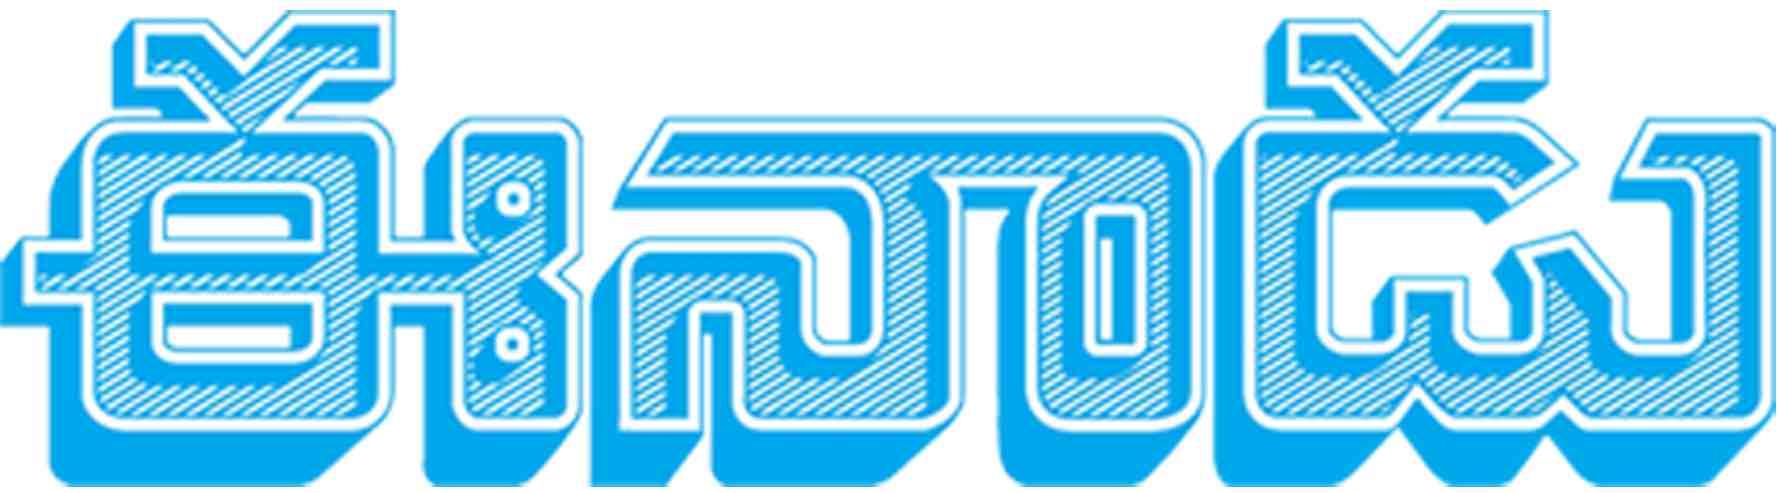 Eenadu (Telugu)